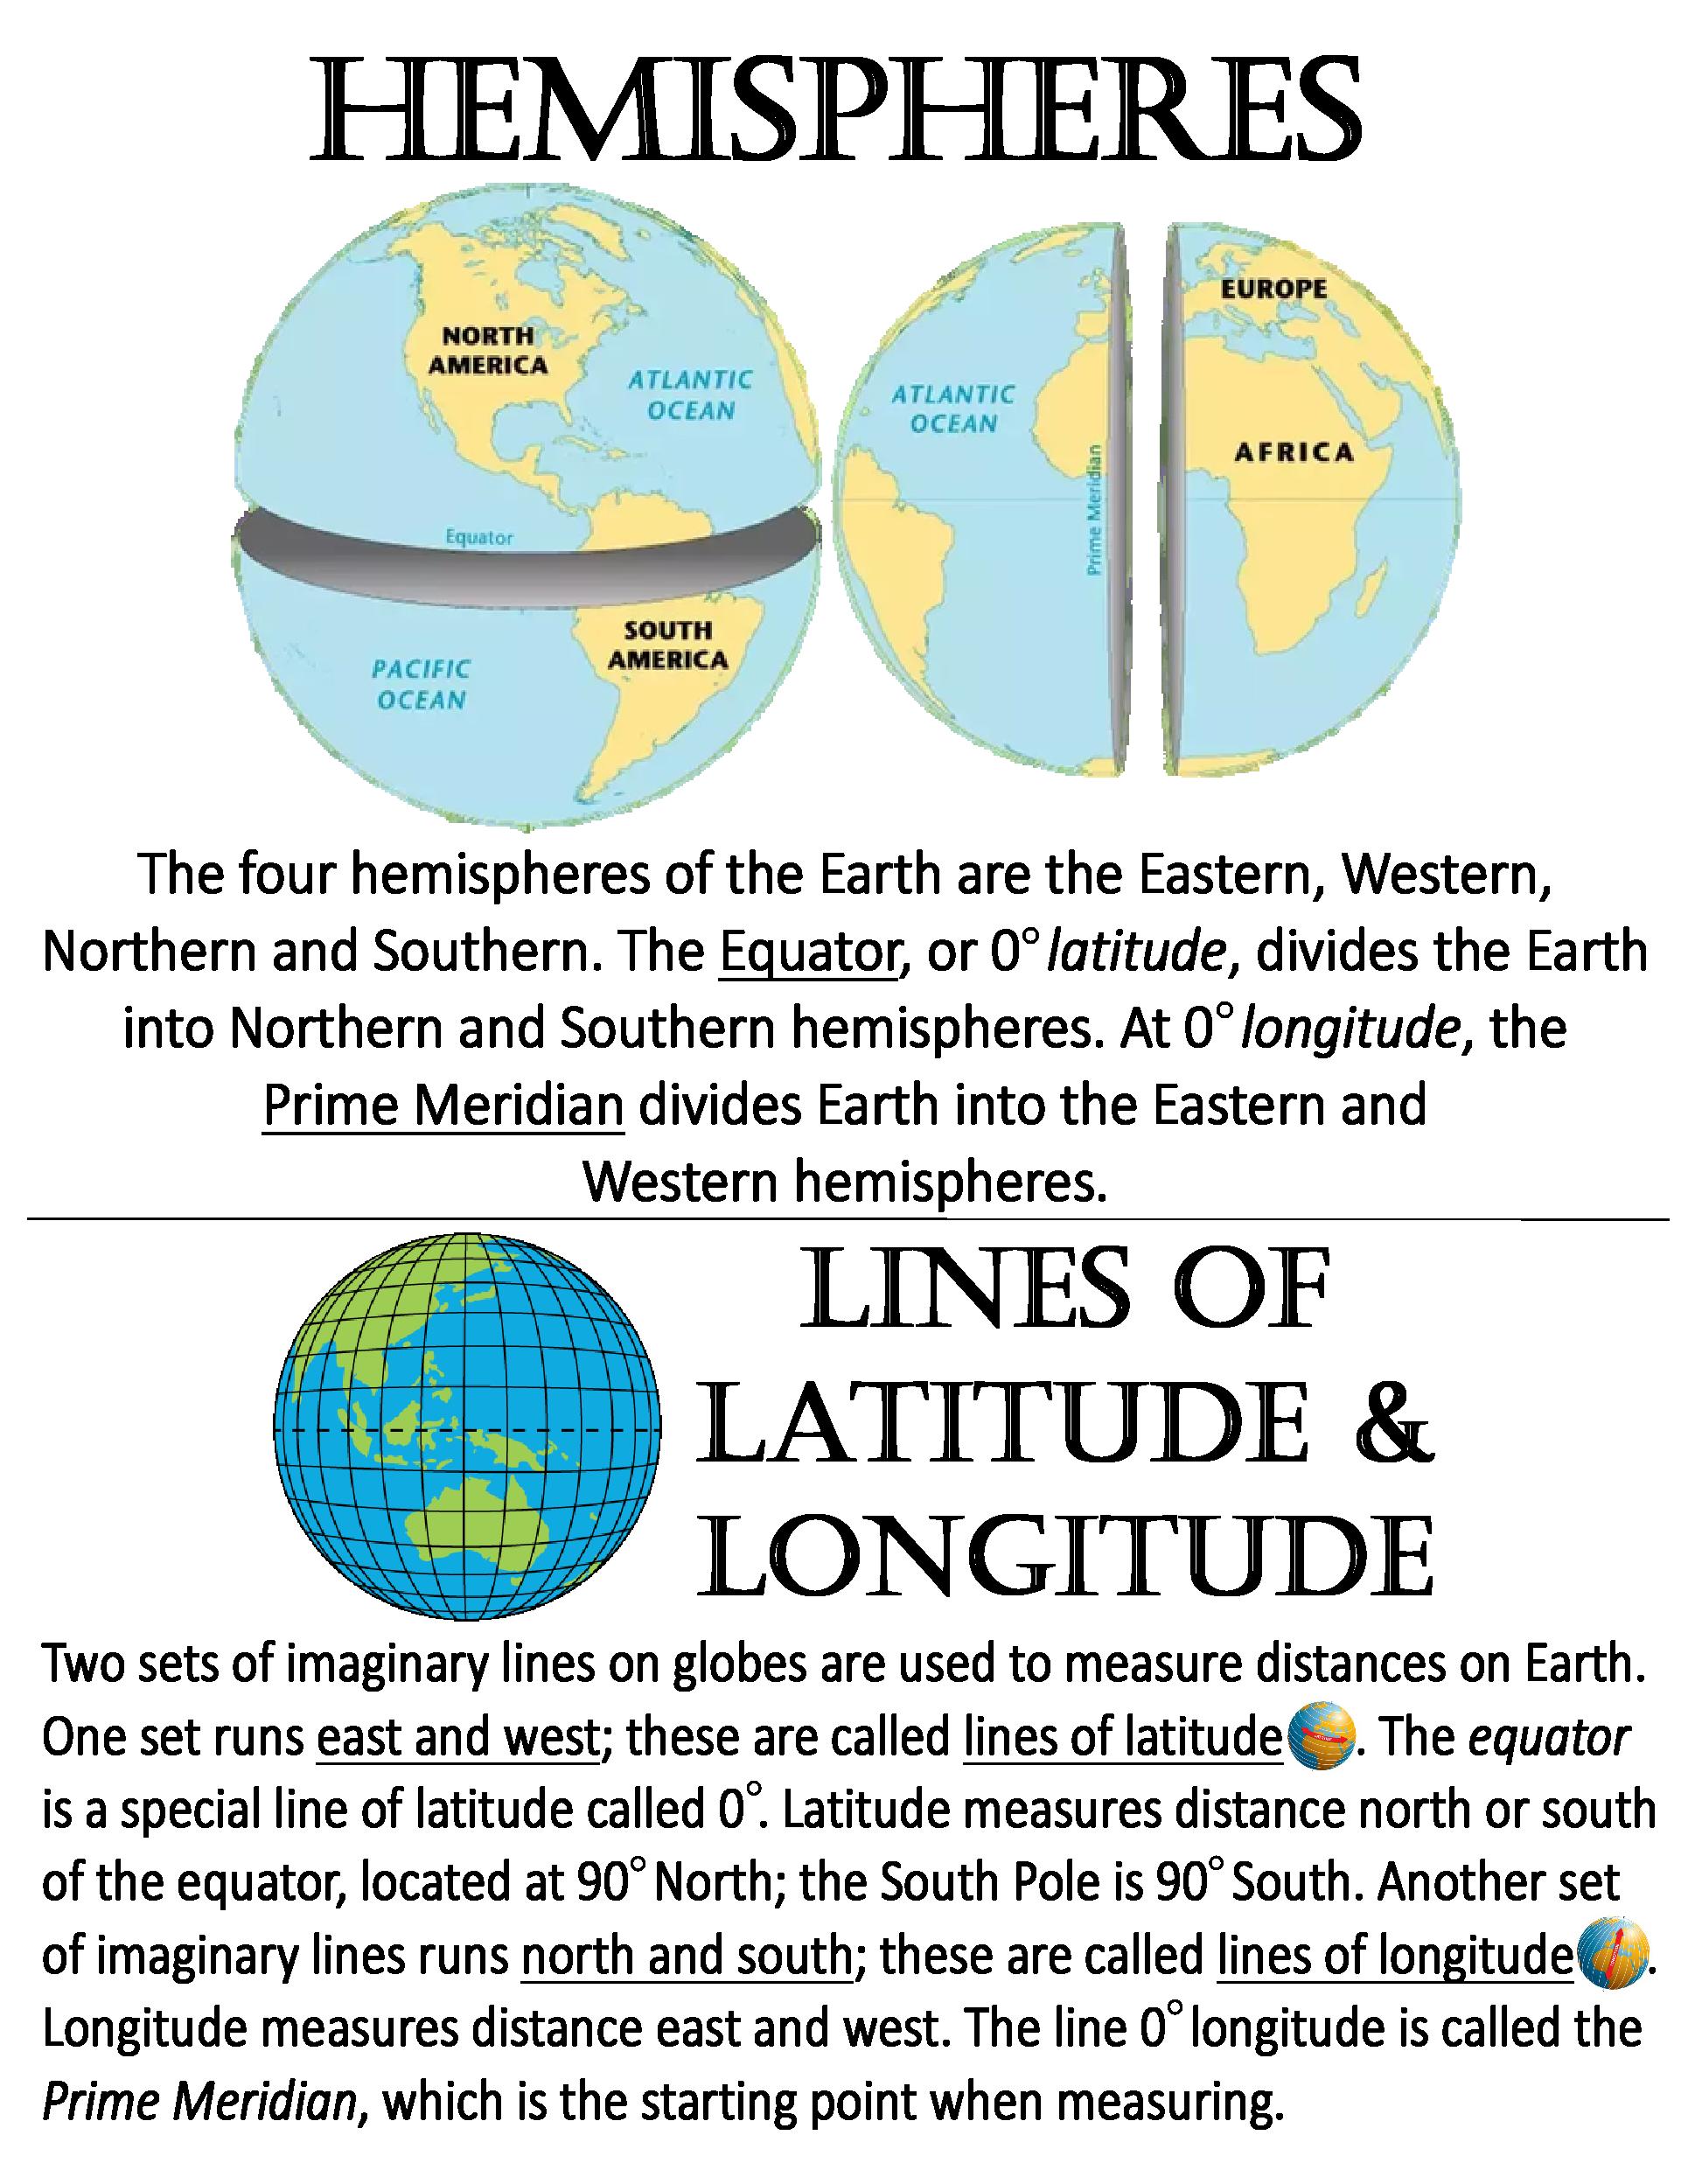 Hemispheres Amp Lines Of Latitude And Longitude Anchor